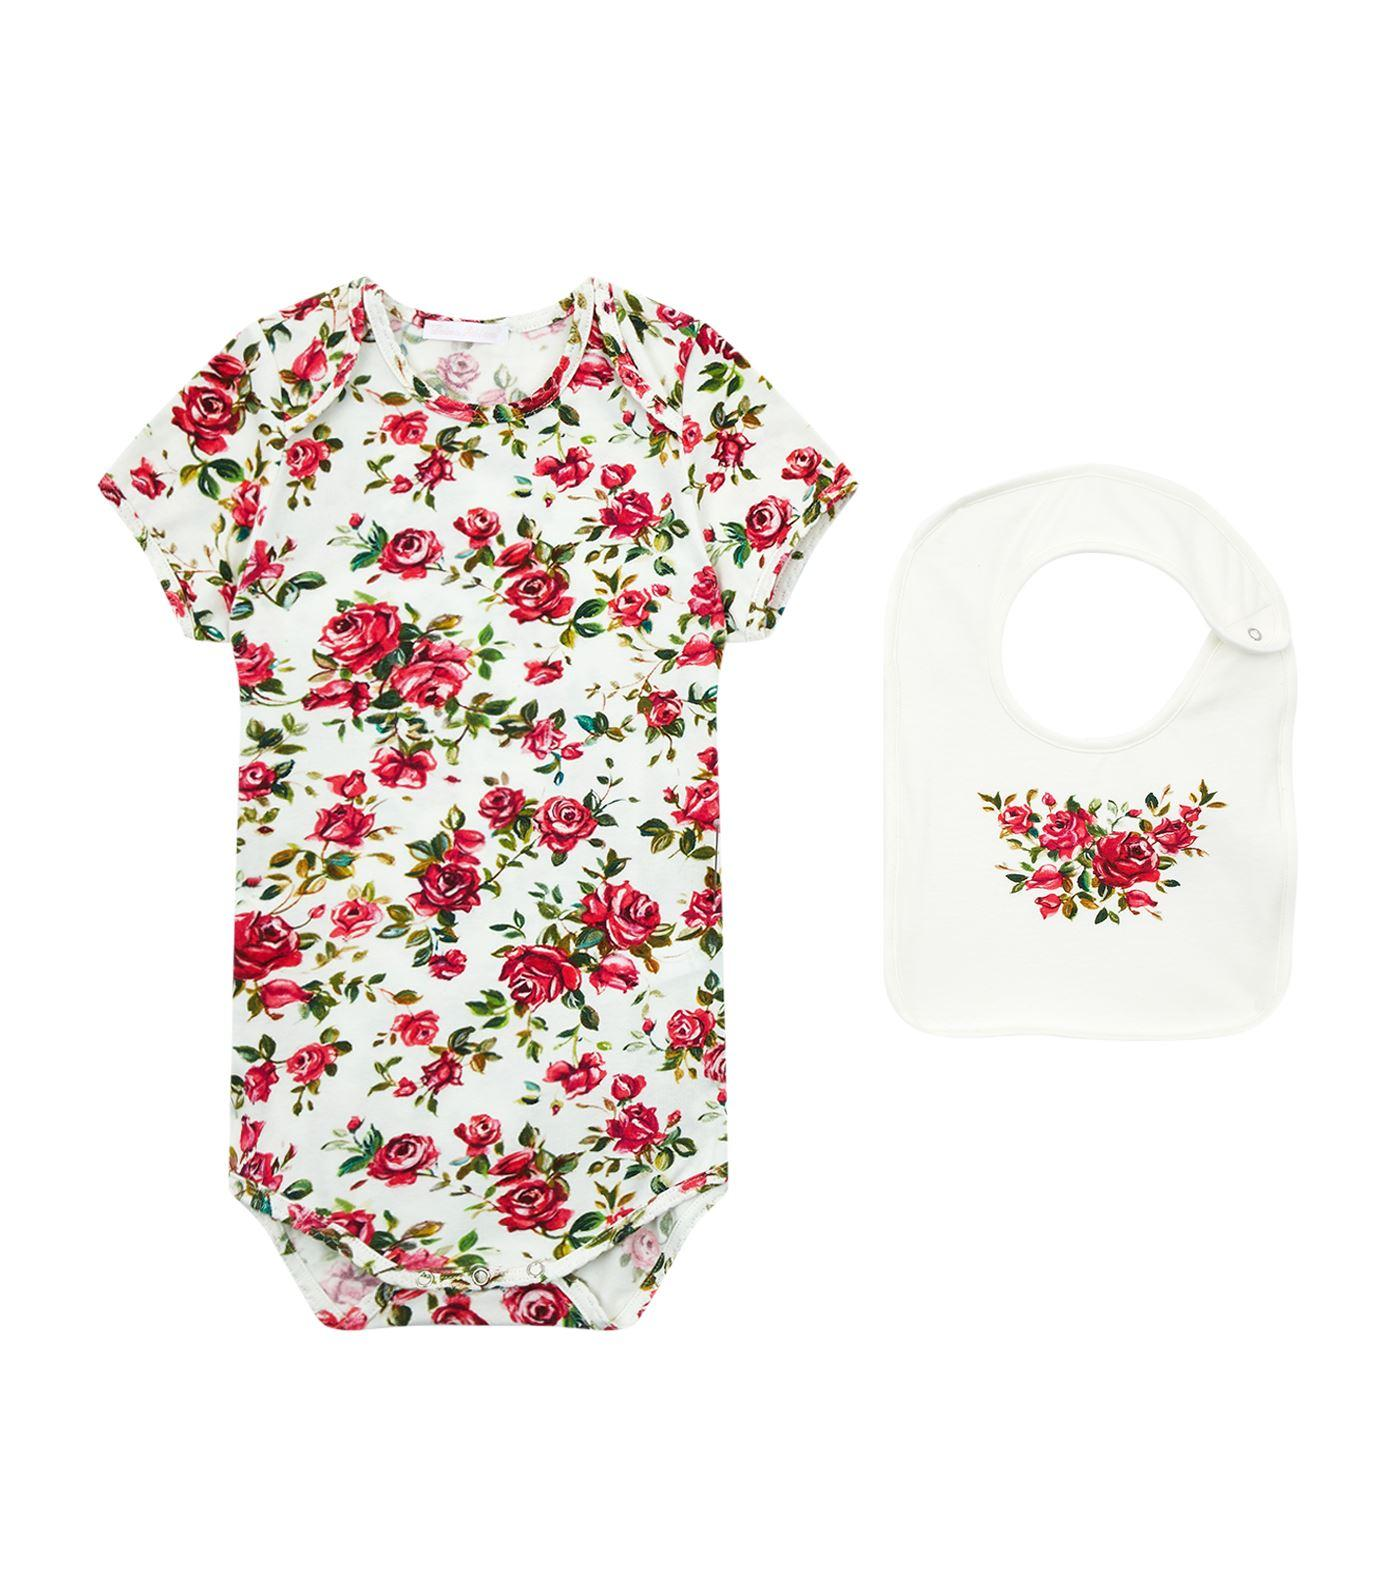 Dolce & Gabbana Rose Print Bodysuit Gift Set In Multi